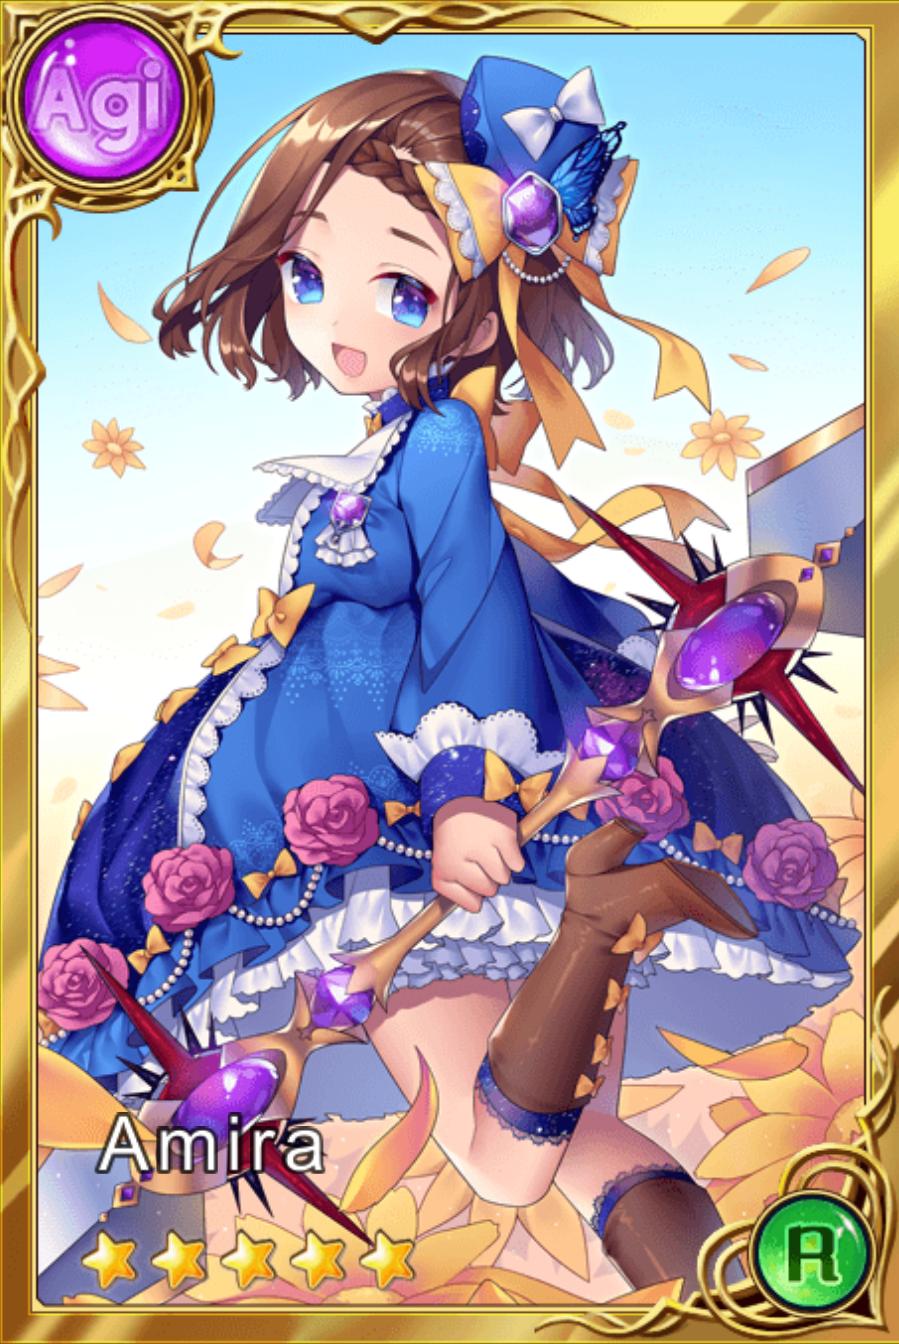 Girlsxbattle Amira Ninja girl, Anime, Battle games